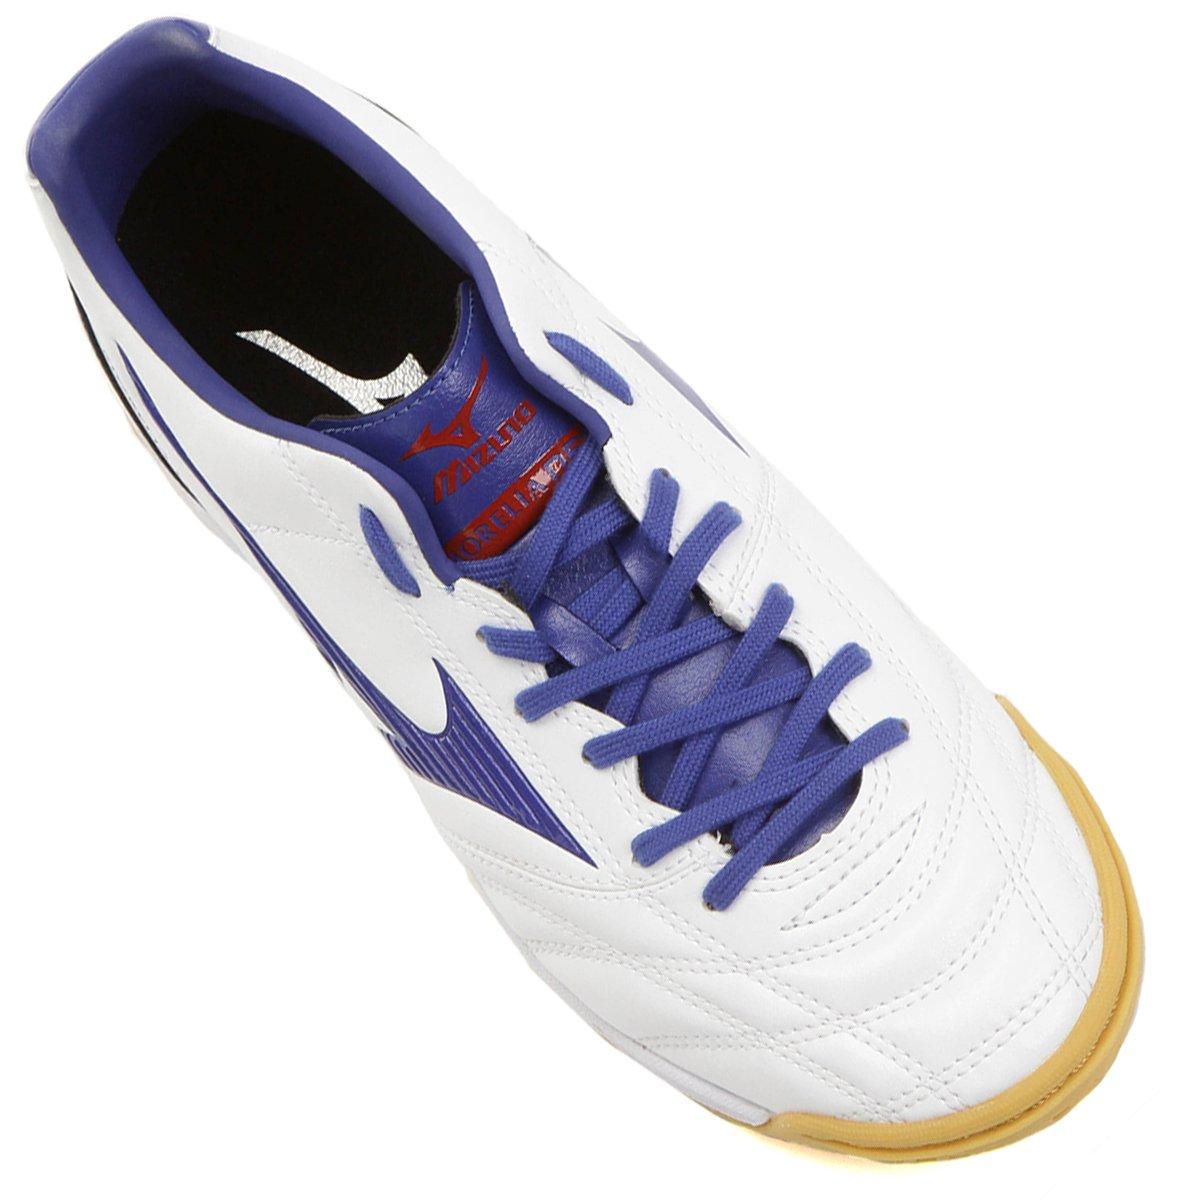 Chuteira Futsal Mizuno Morelia Neo Classic Salão Masculina affordable price  99b04 c1a54 ... f66227bd64f0d